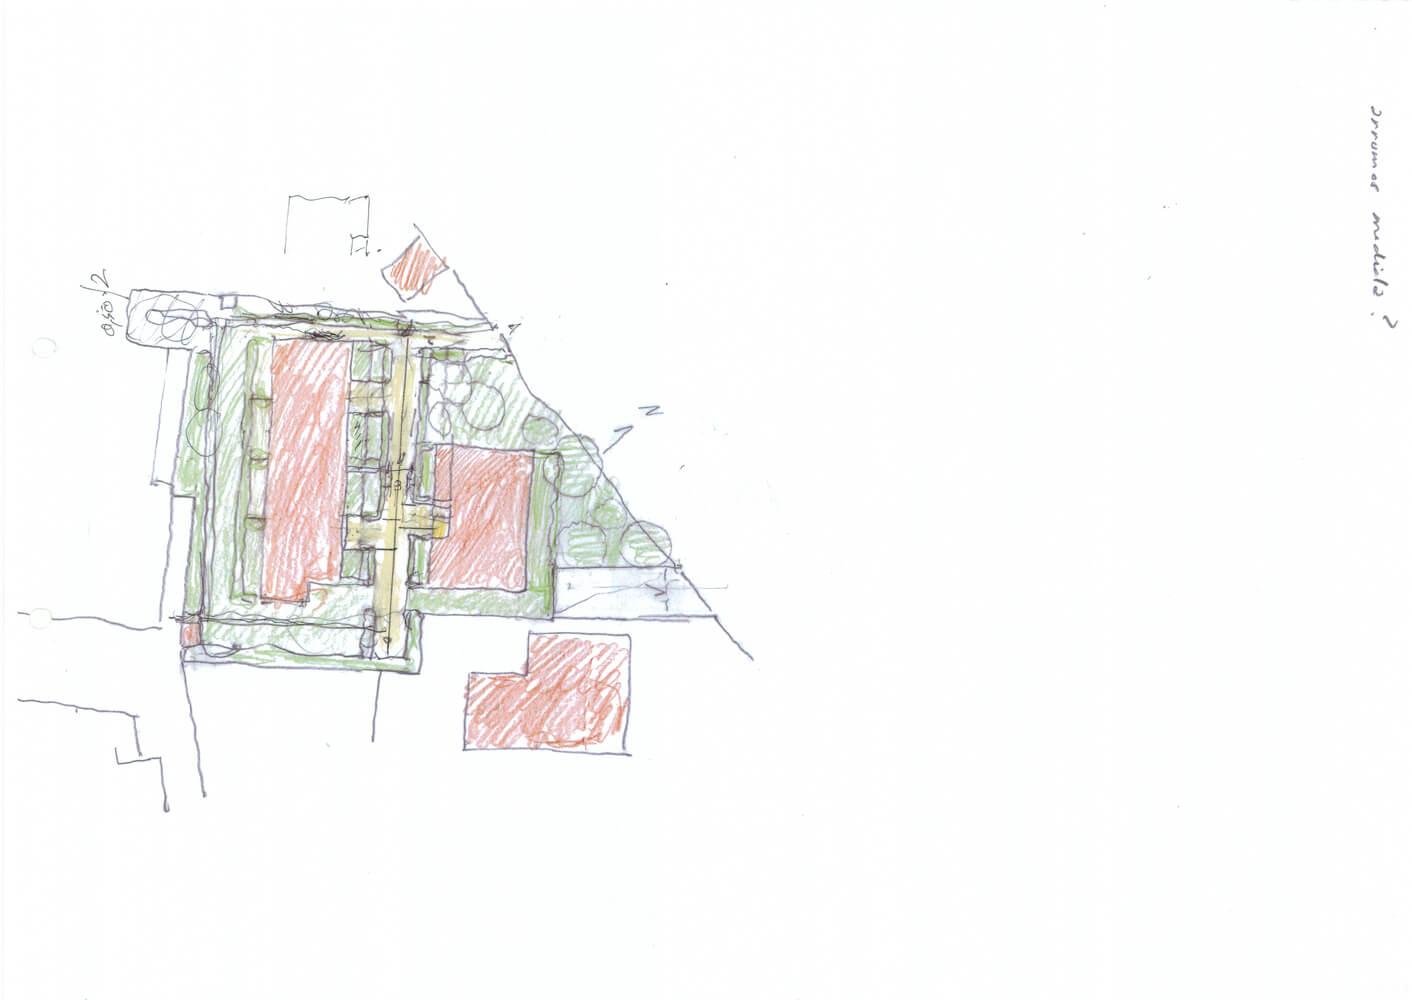 Complexo Residencial em Gallarate